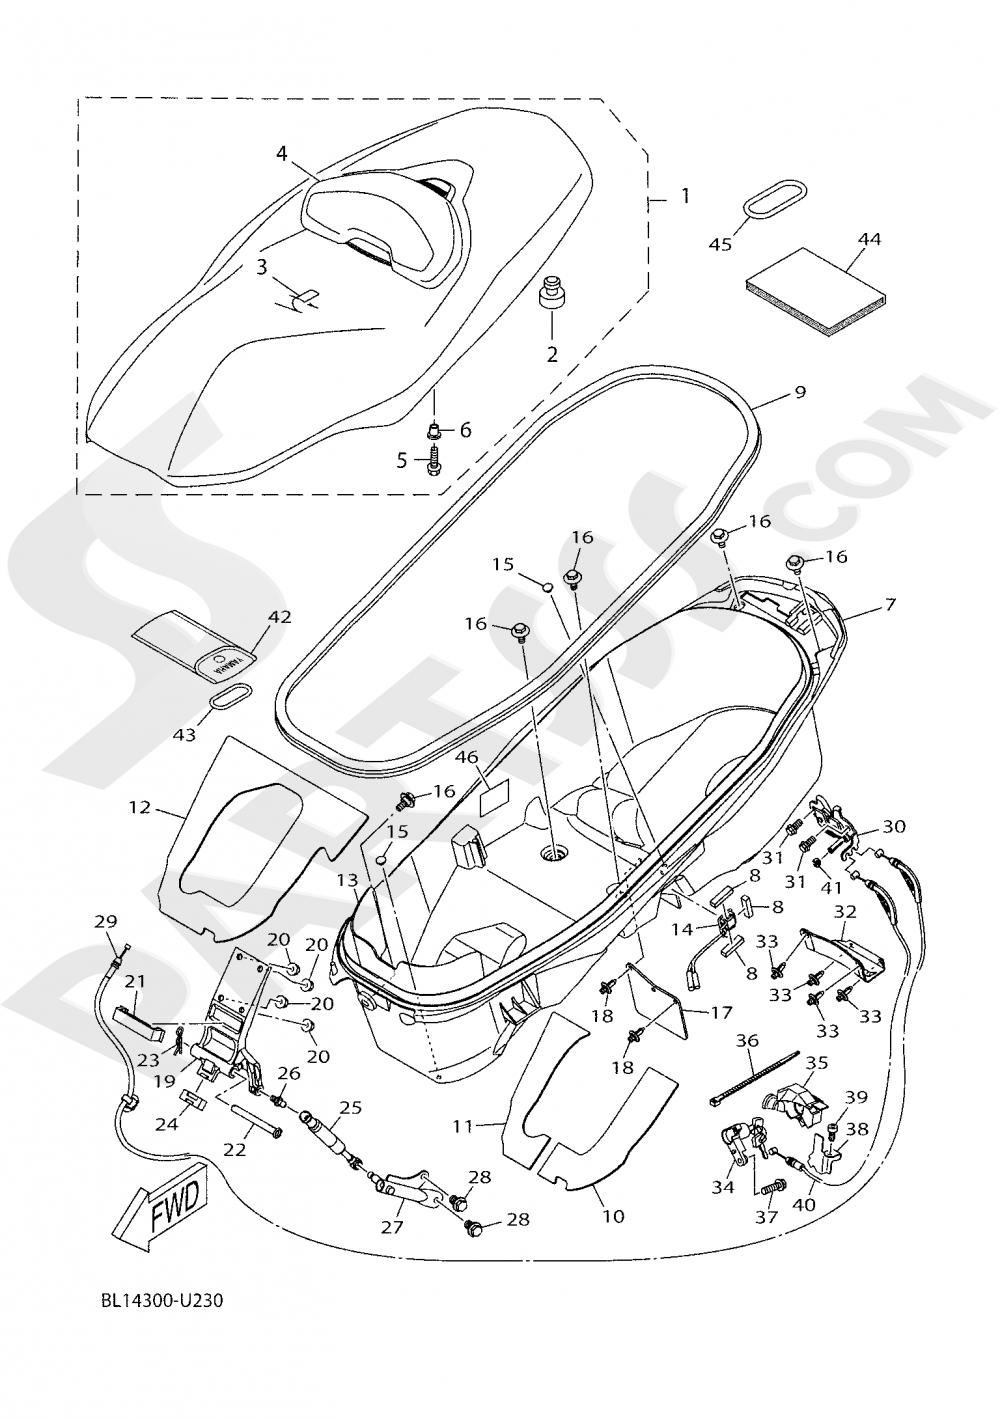 SEAT Yamaha XMAX 400 TECH MAX 2020